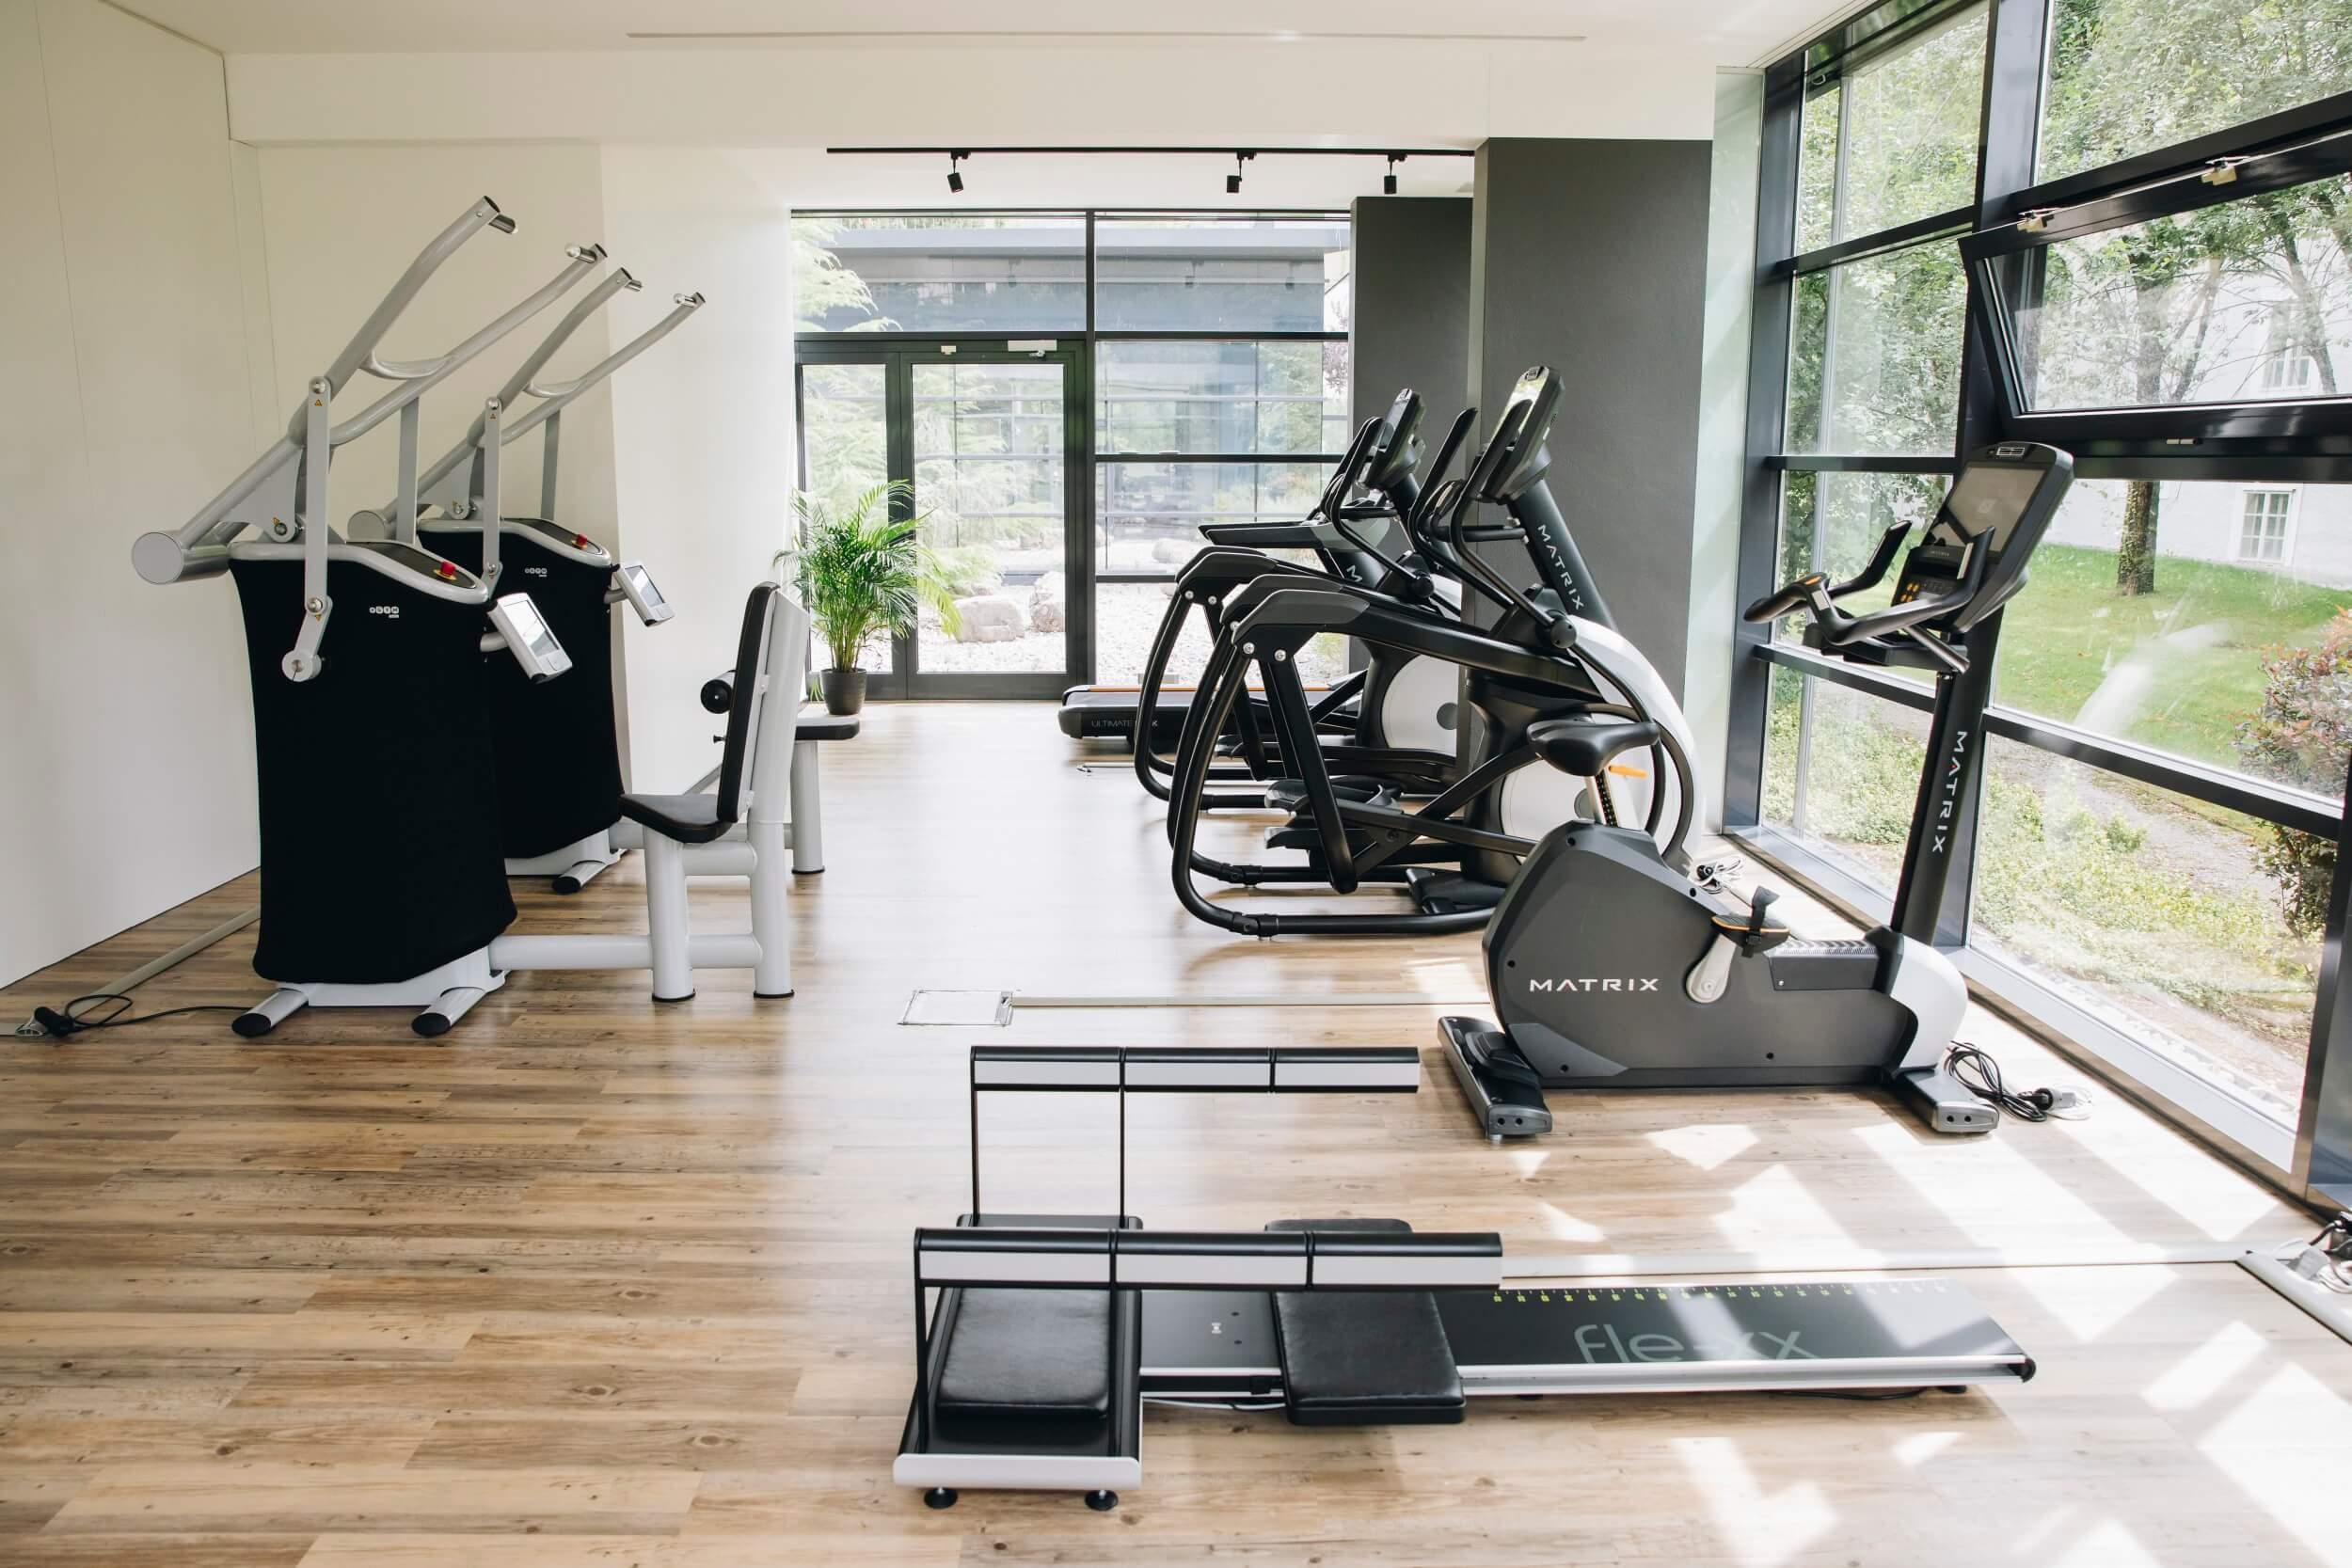 Cardiogeräte und Kraftgeräte im Fitnessstudio MAIKAI in Salzburg